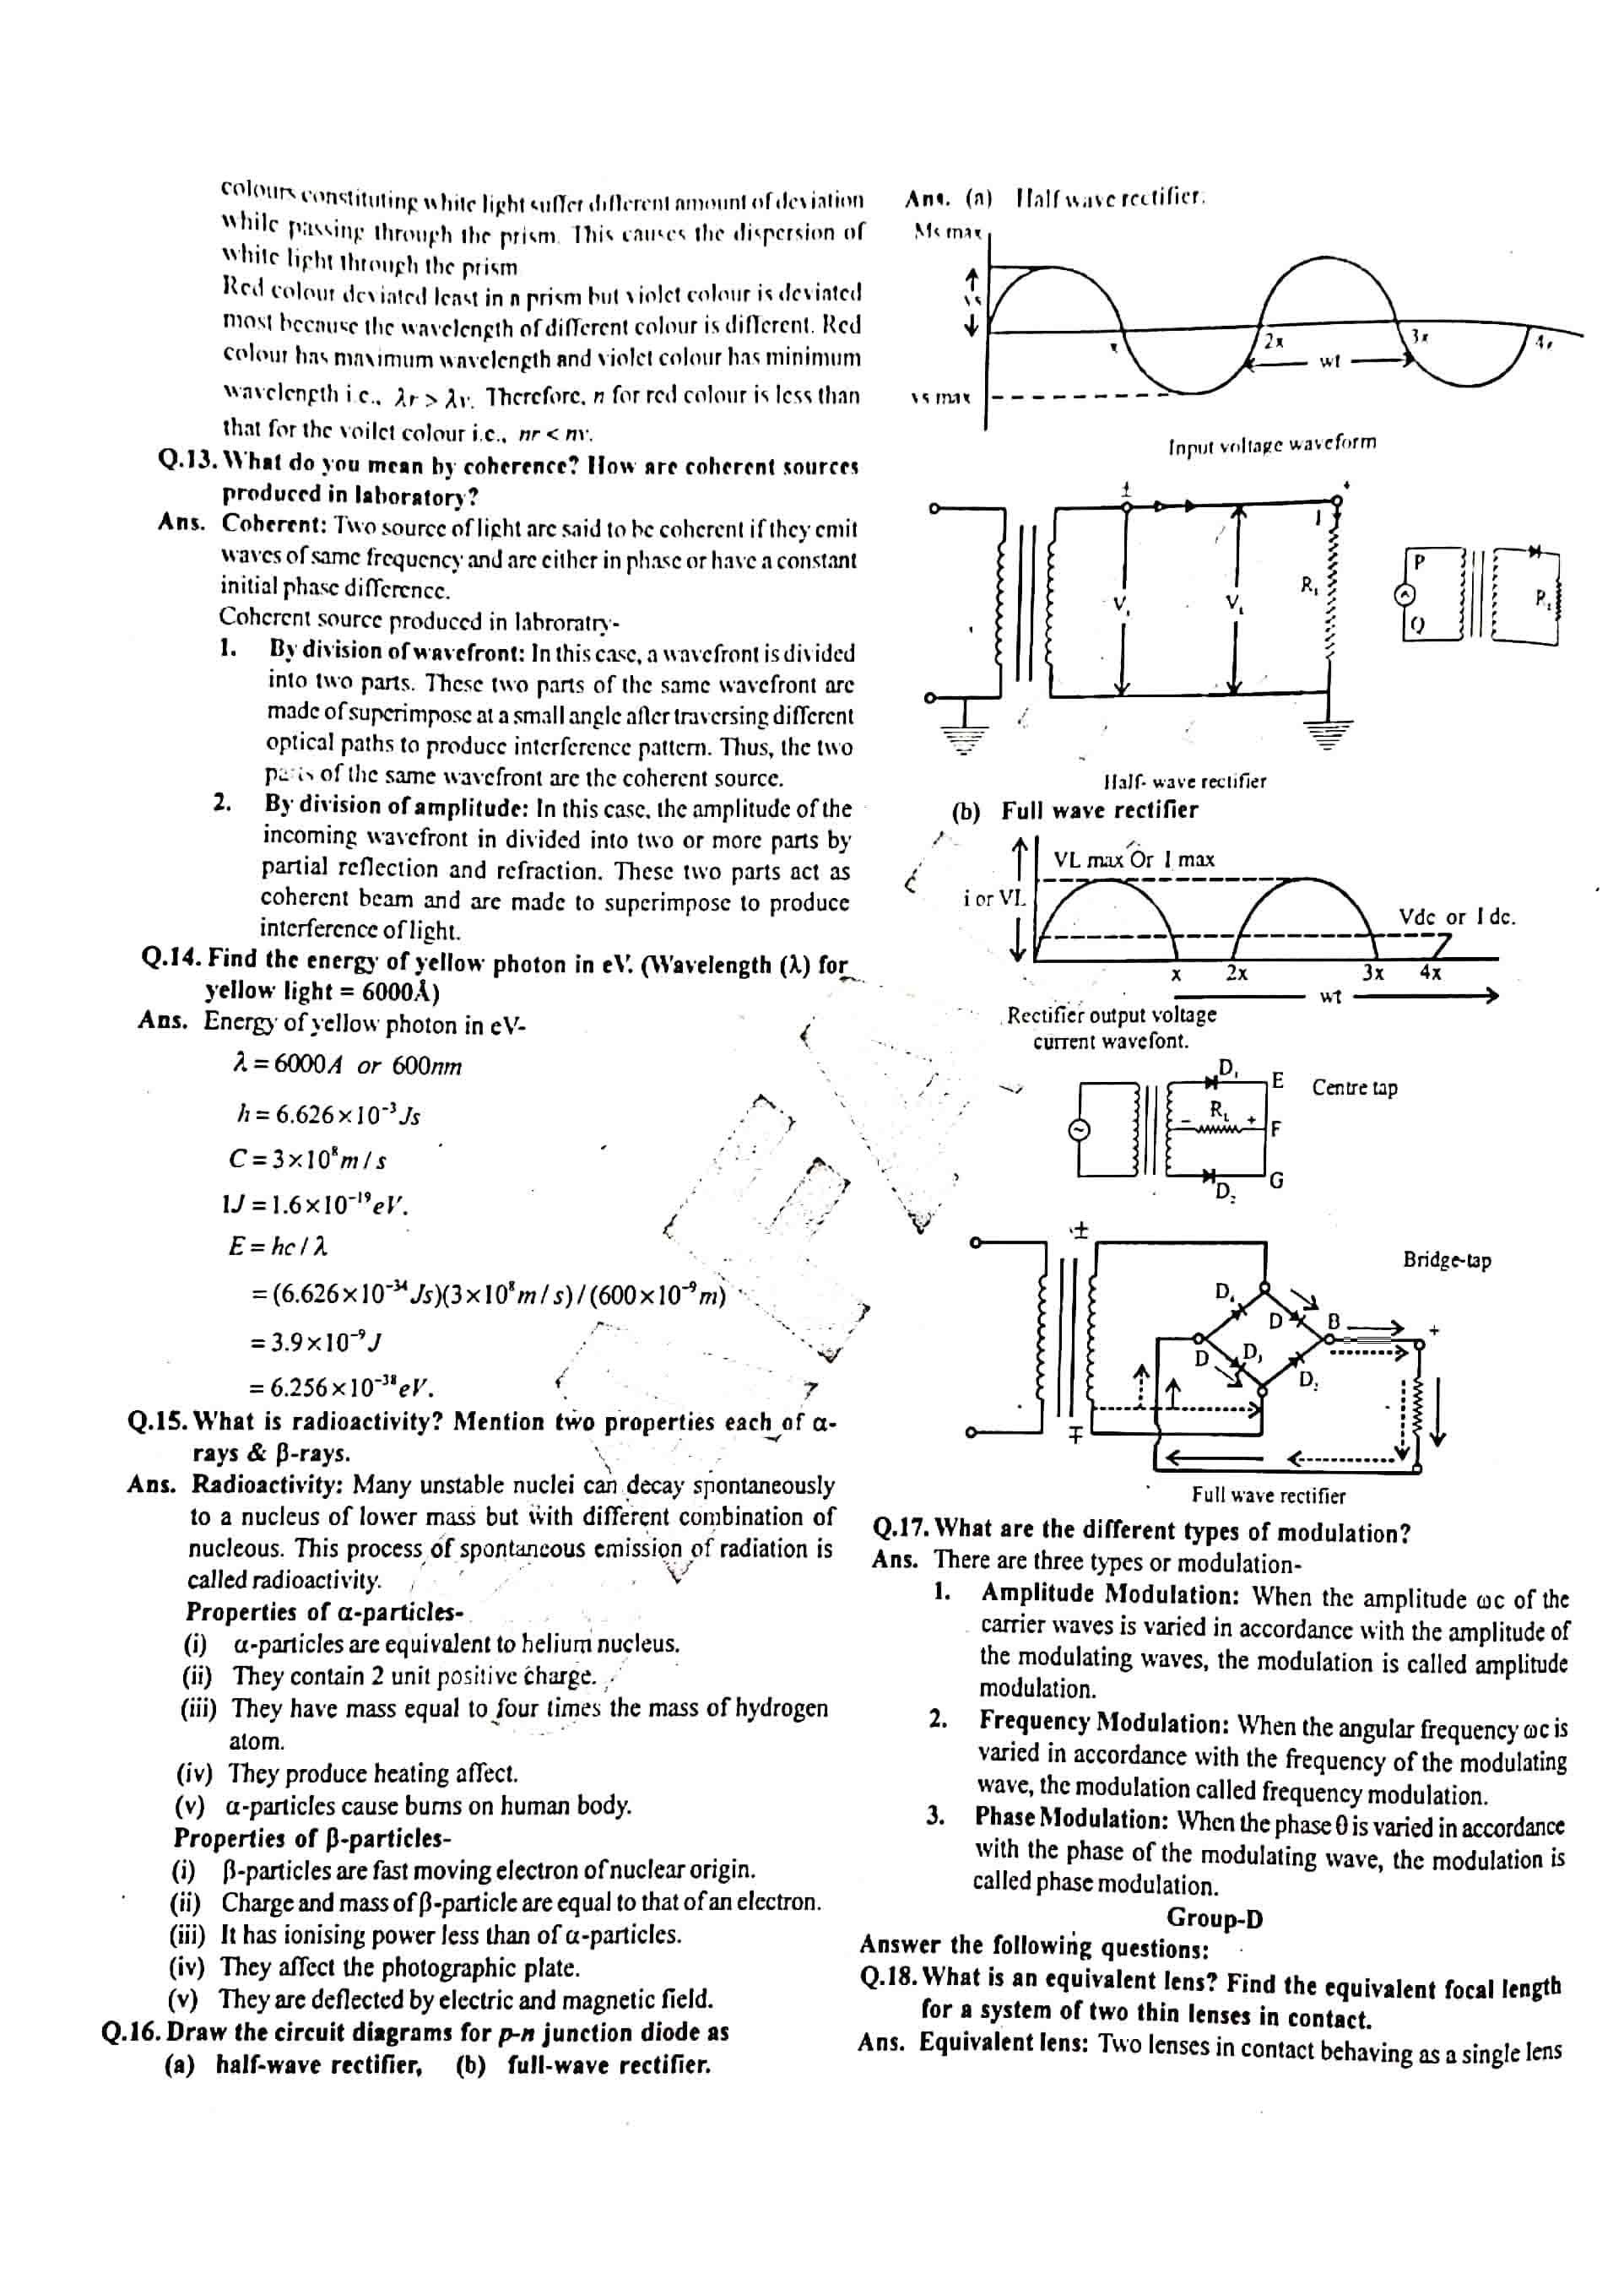 JAC Class 12 Physics 2015 Question Paper 03